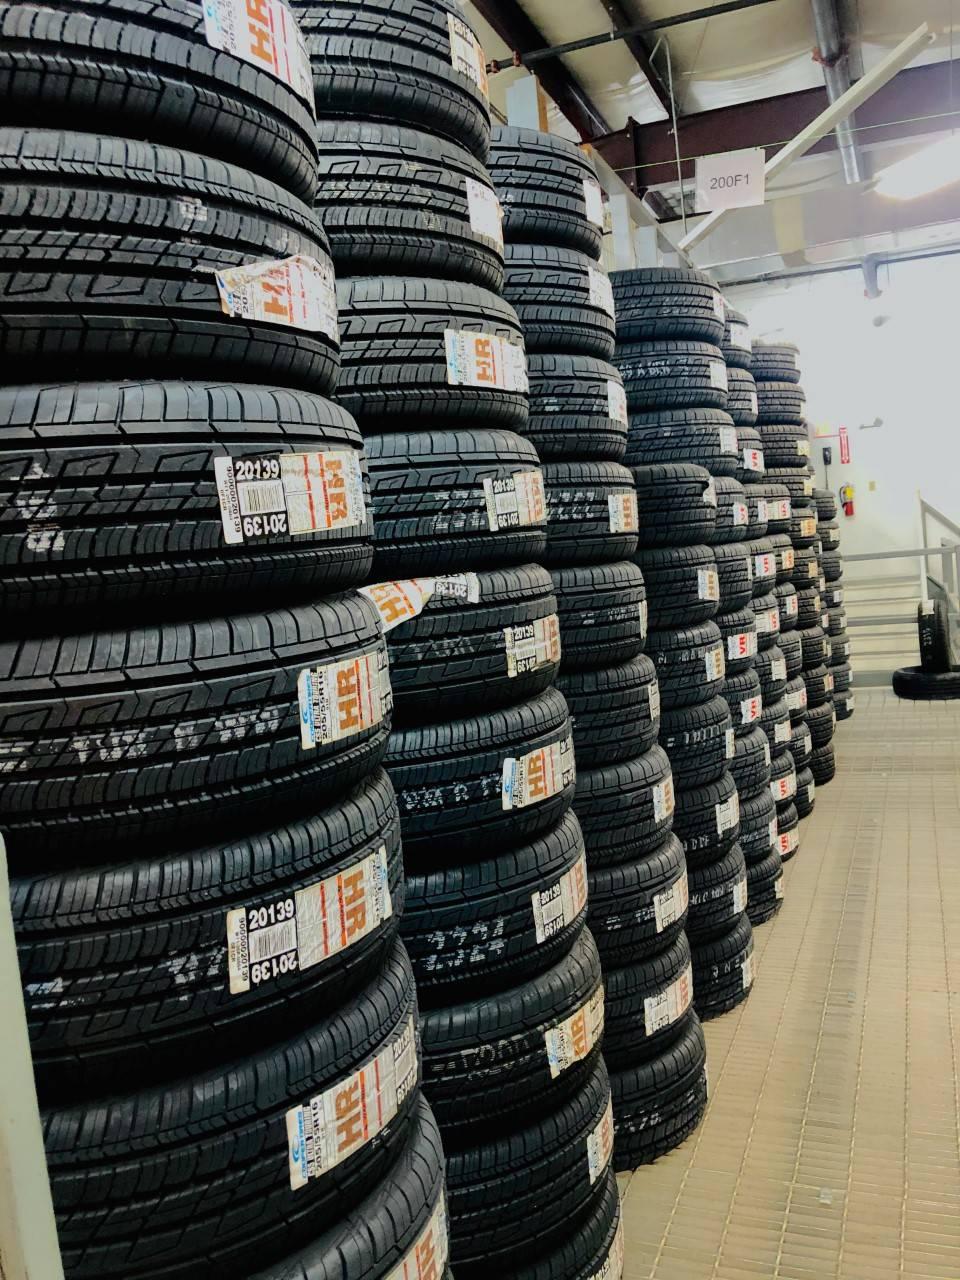 Universal Hyundai Parts Center - car repair  | Photo 3 of 10 | Address: 12801 S Orange Blossom Trail, Orlando, FL 32837, USA | Phone: (407) 545-8495